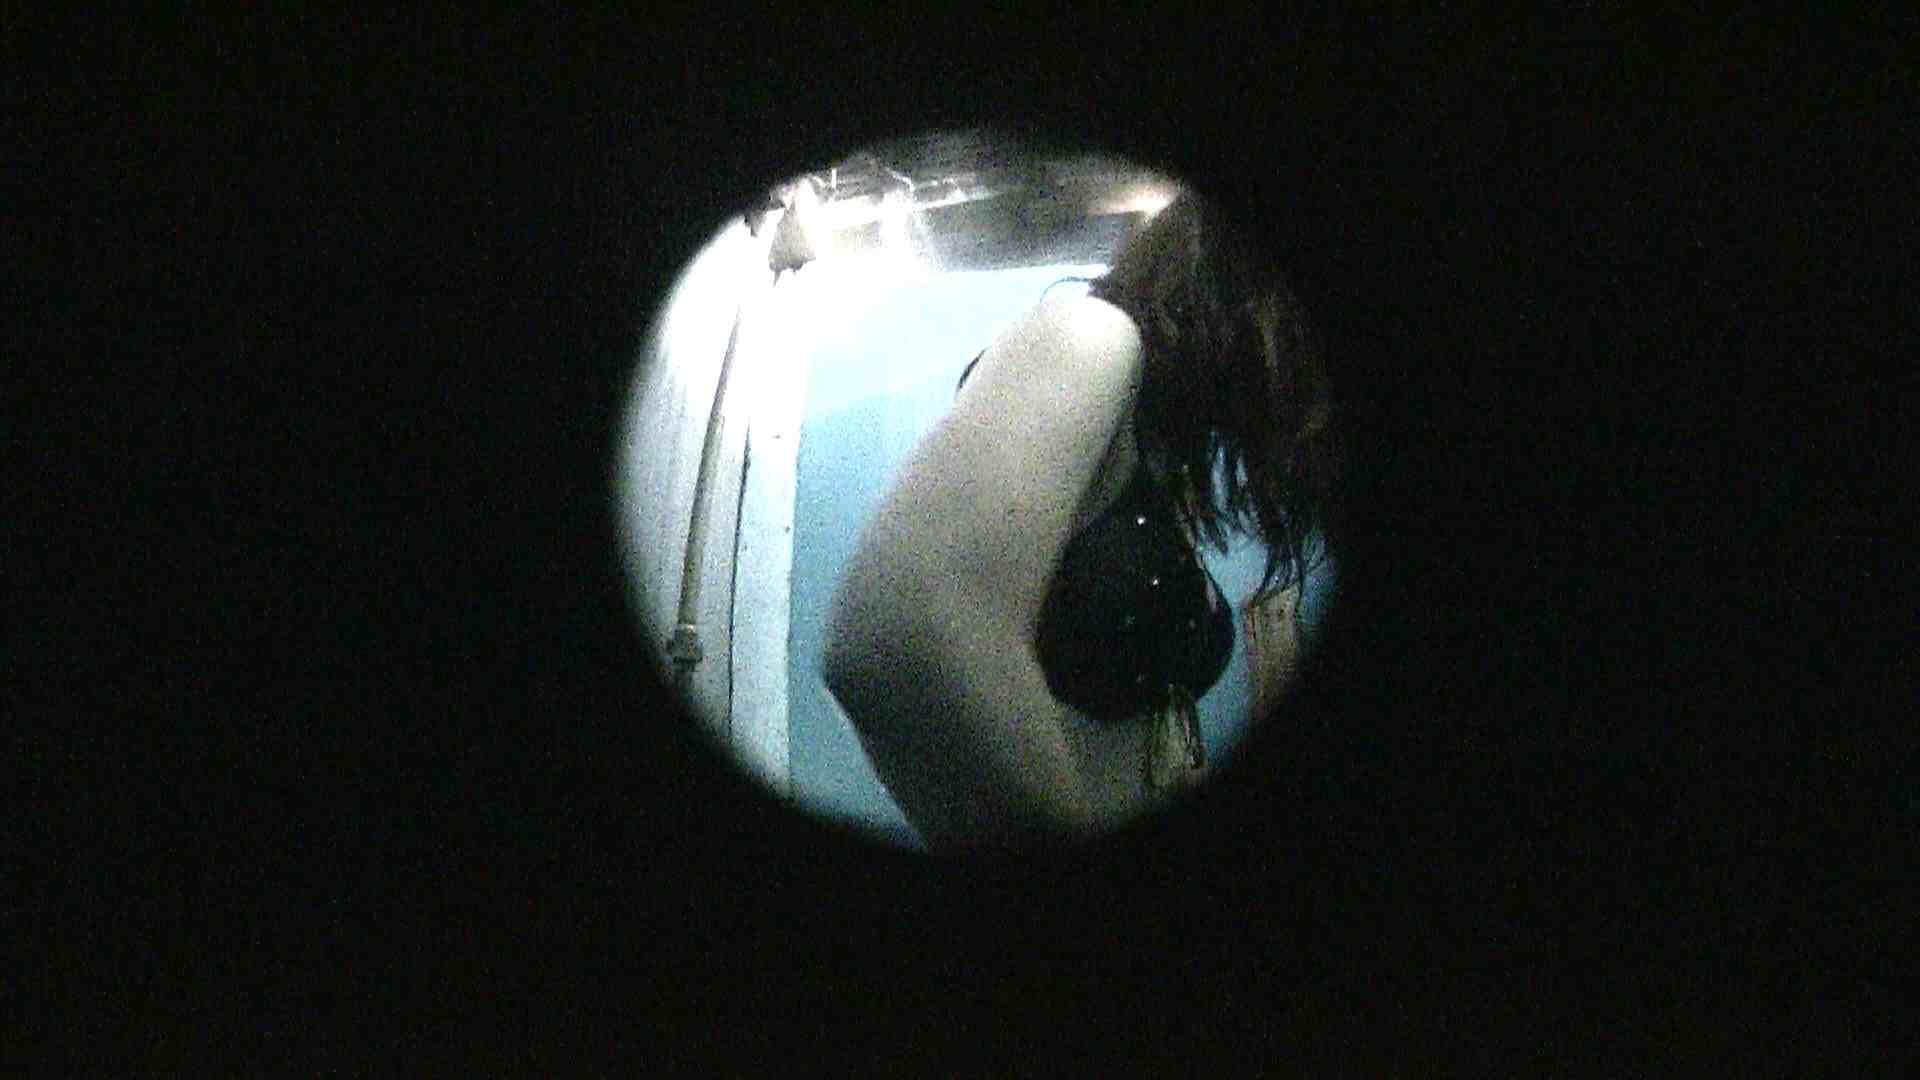 NO.13 暗いですが豪快な砂落としが好印象 シャワー | シャワー室  88PIX 58